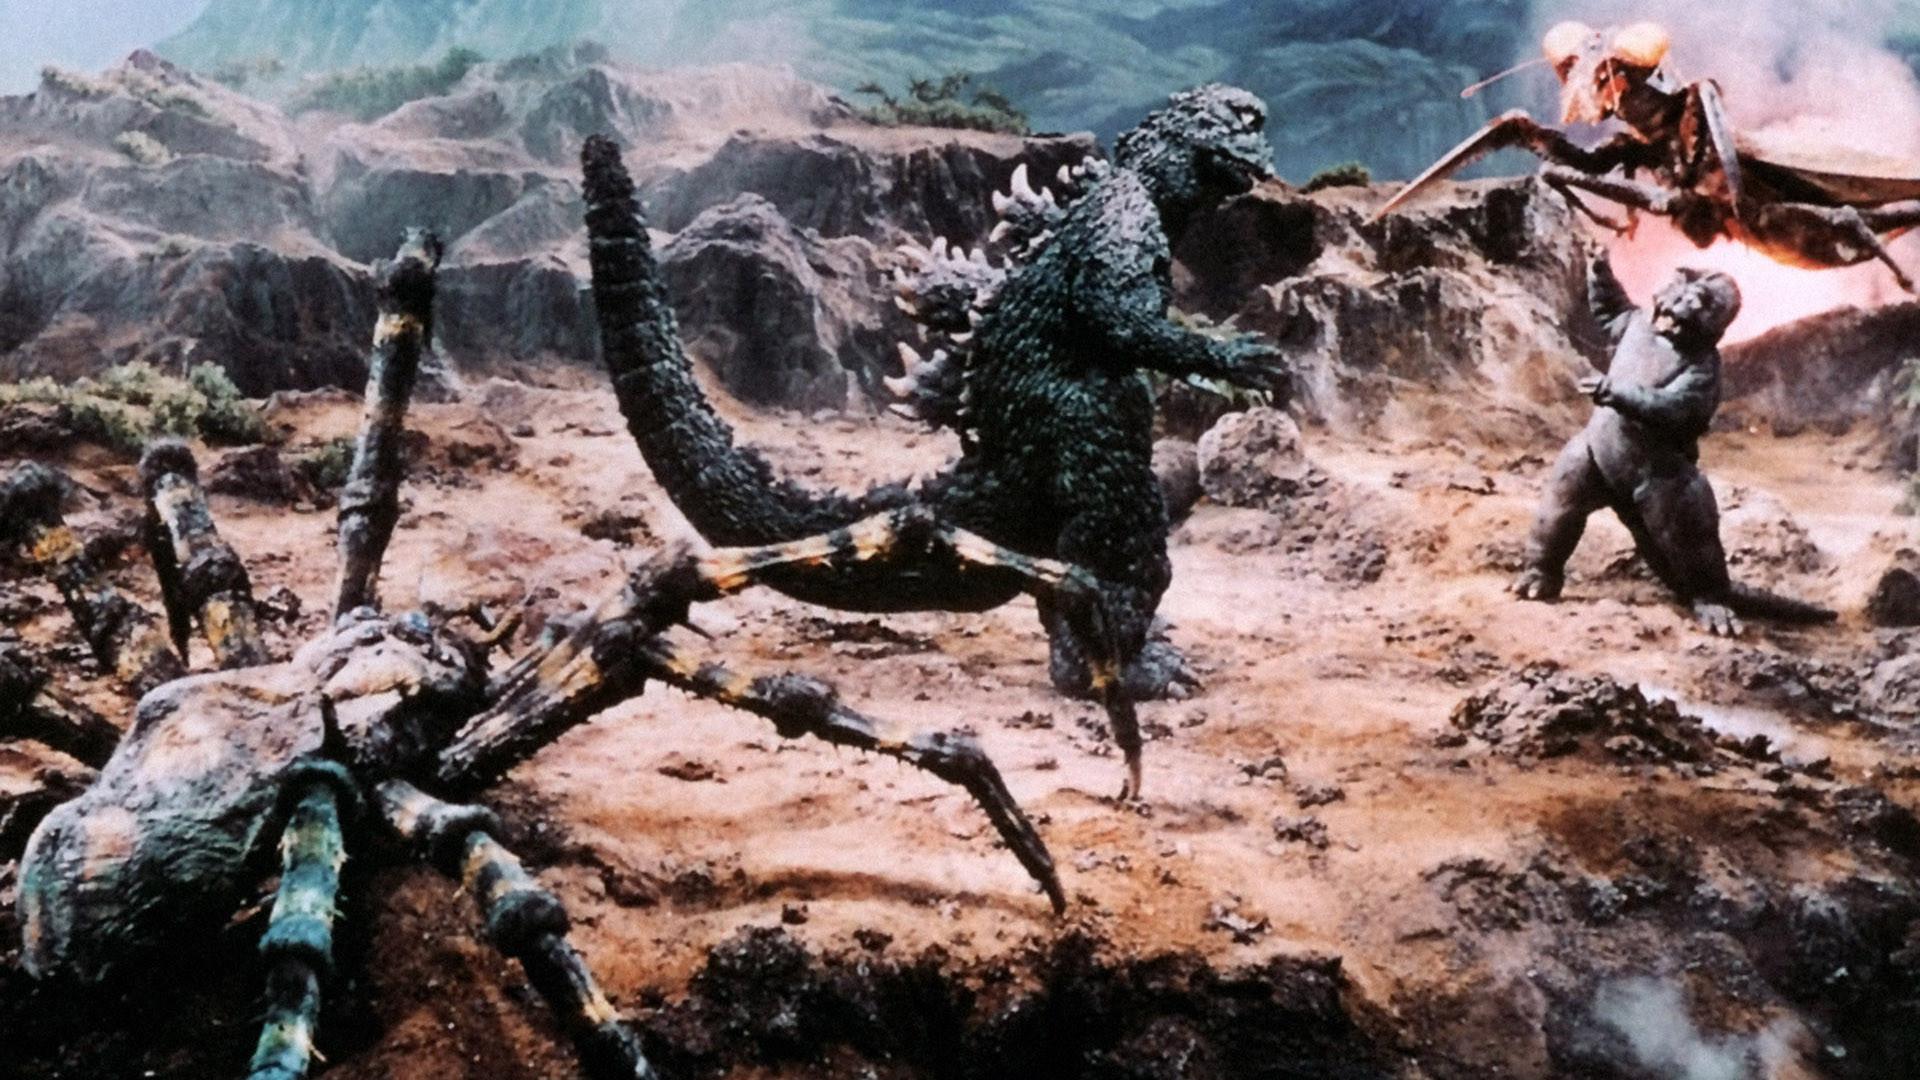 Image – Son-of-Godzilla-Wallpapers-2.jpg | Gojipedia | FANDOM powered by  Wikia